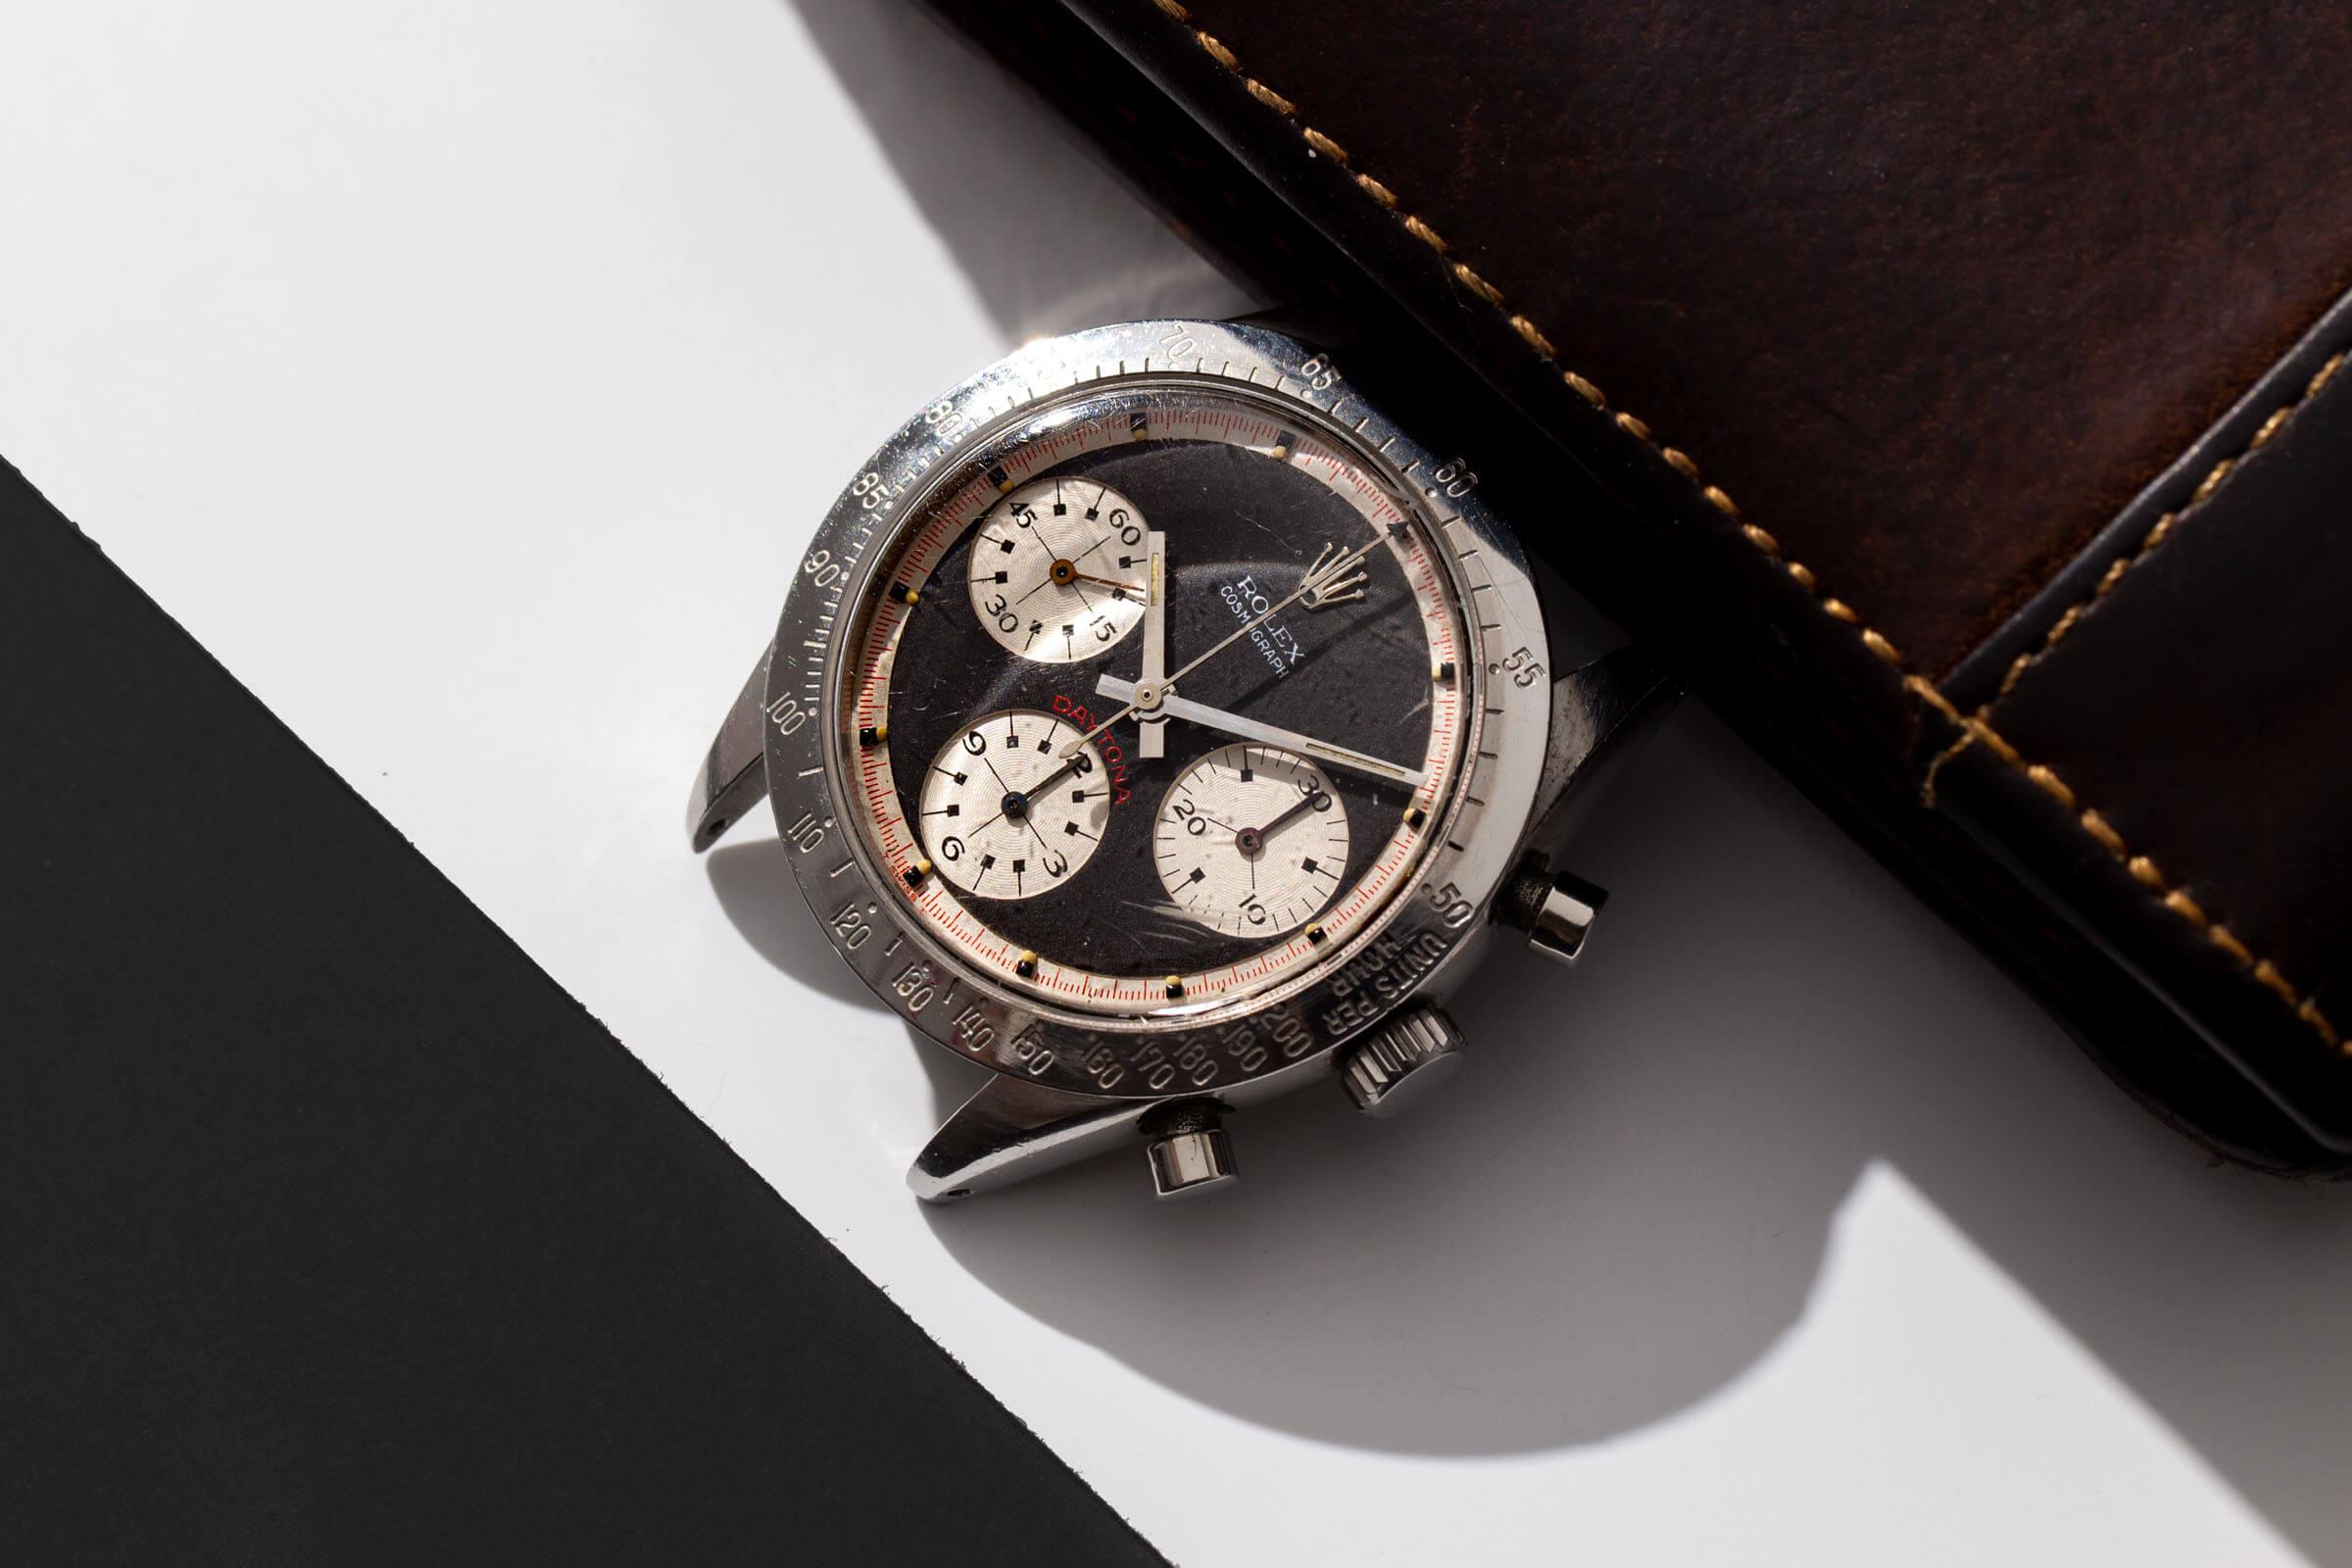 Vintage-Rolex-Daytona-Paul-Newman-6239